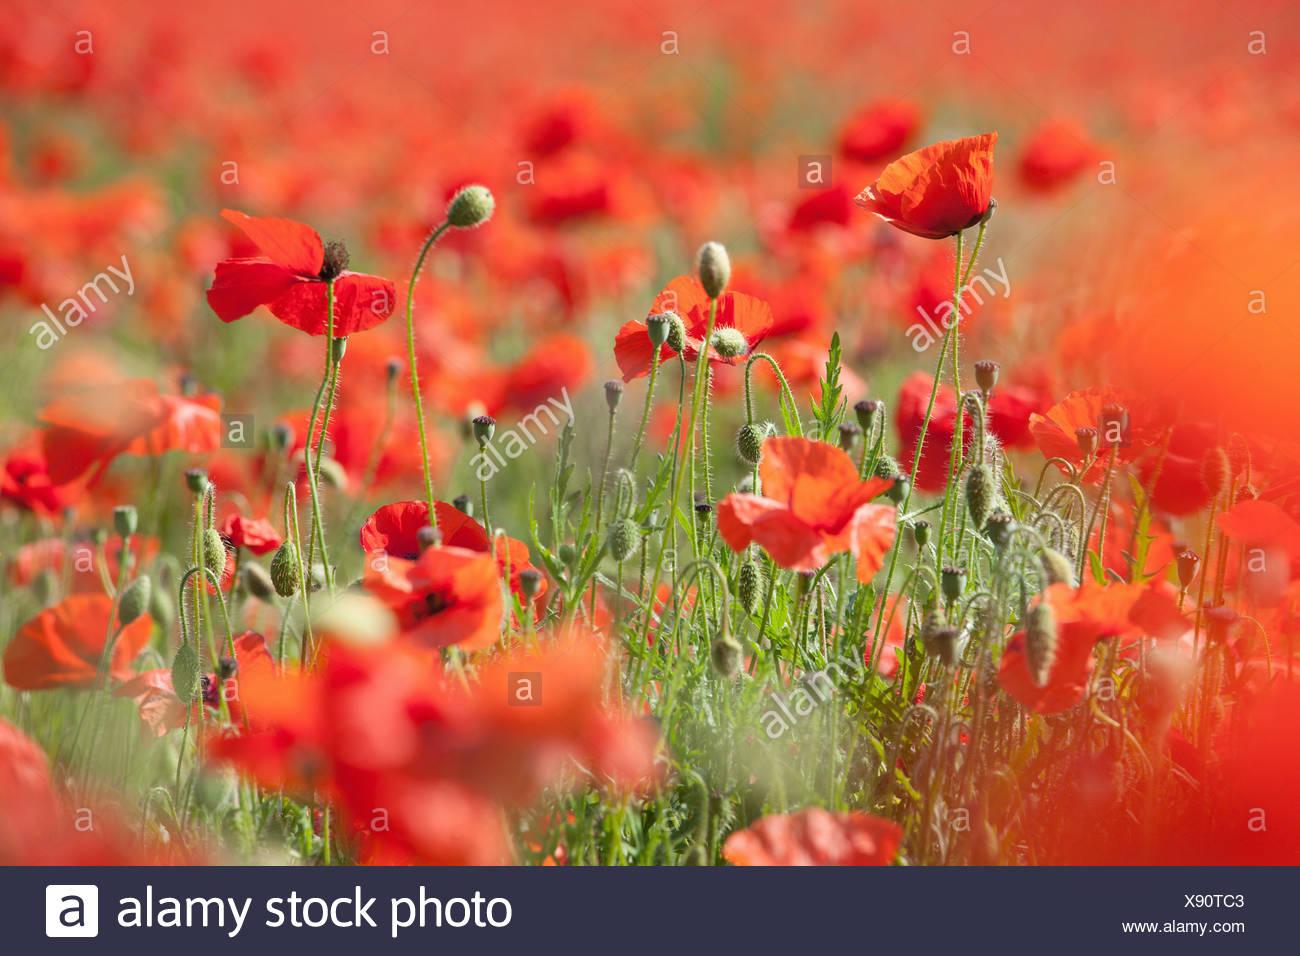 ENGLAND; NORFOLK; POPPY; FIELD; RED; FLOWER; POPPIES; FLOWERS; DETAIL - Stock Image